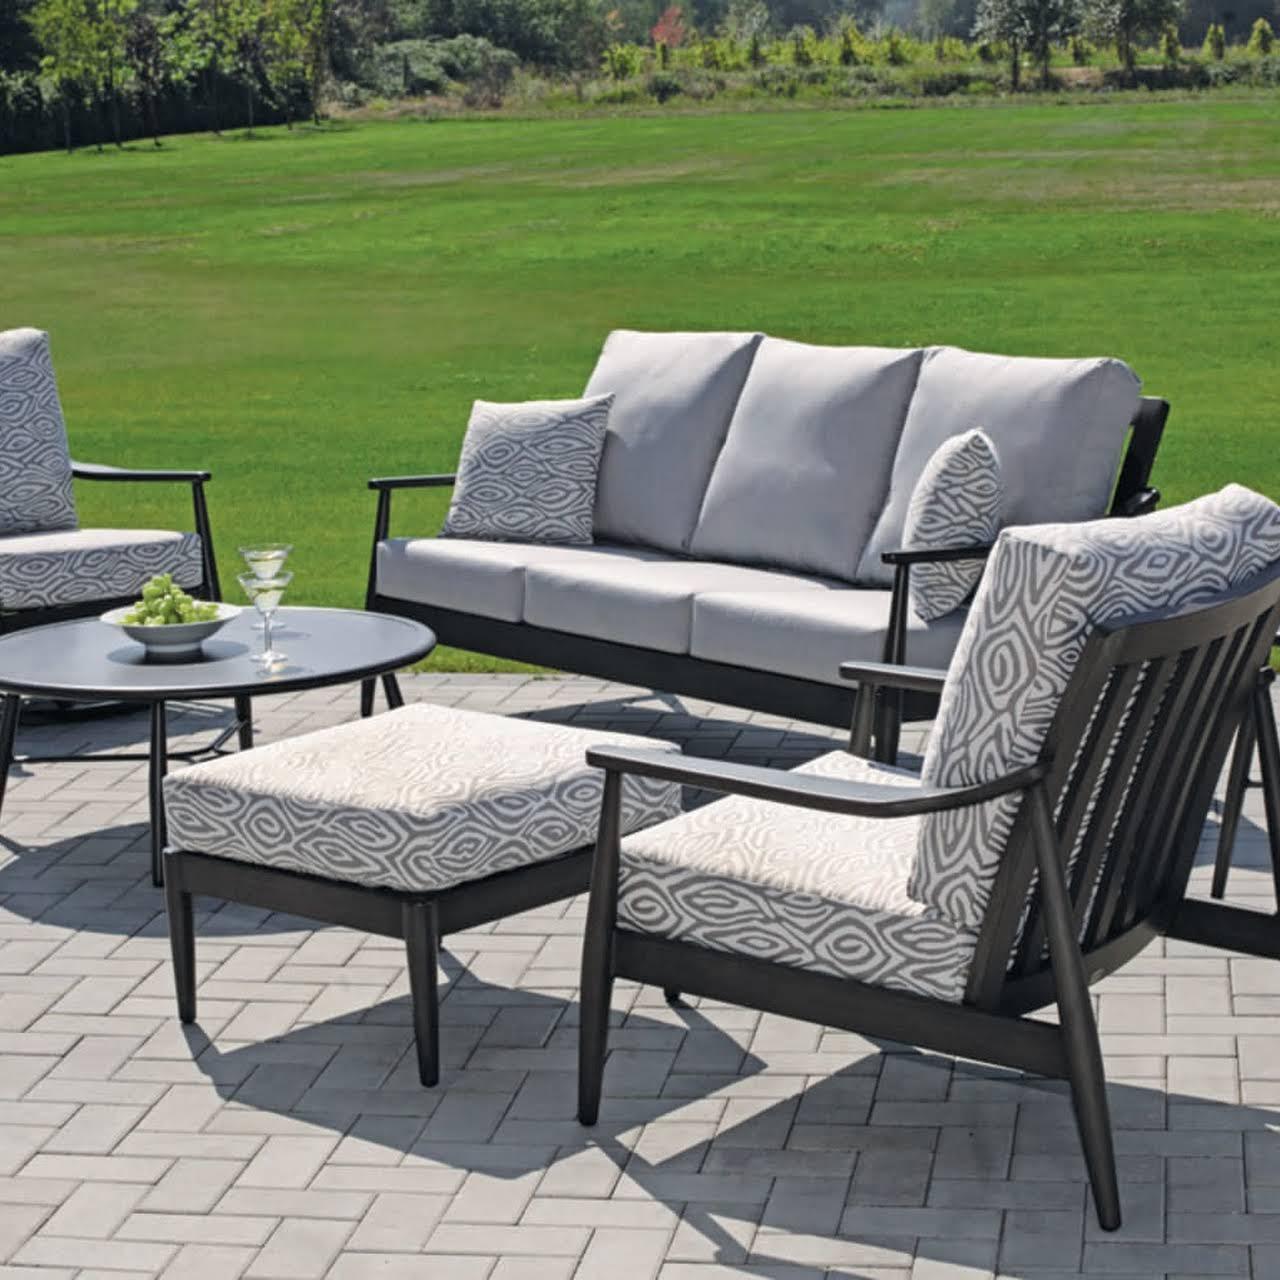 Insideout patio furniture burlington closing last day sept